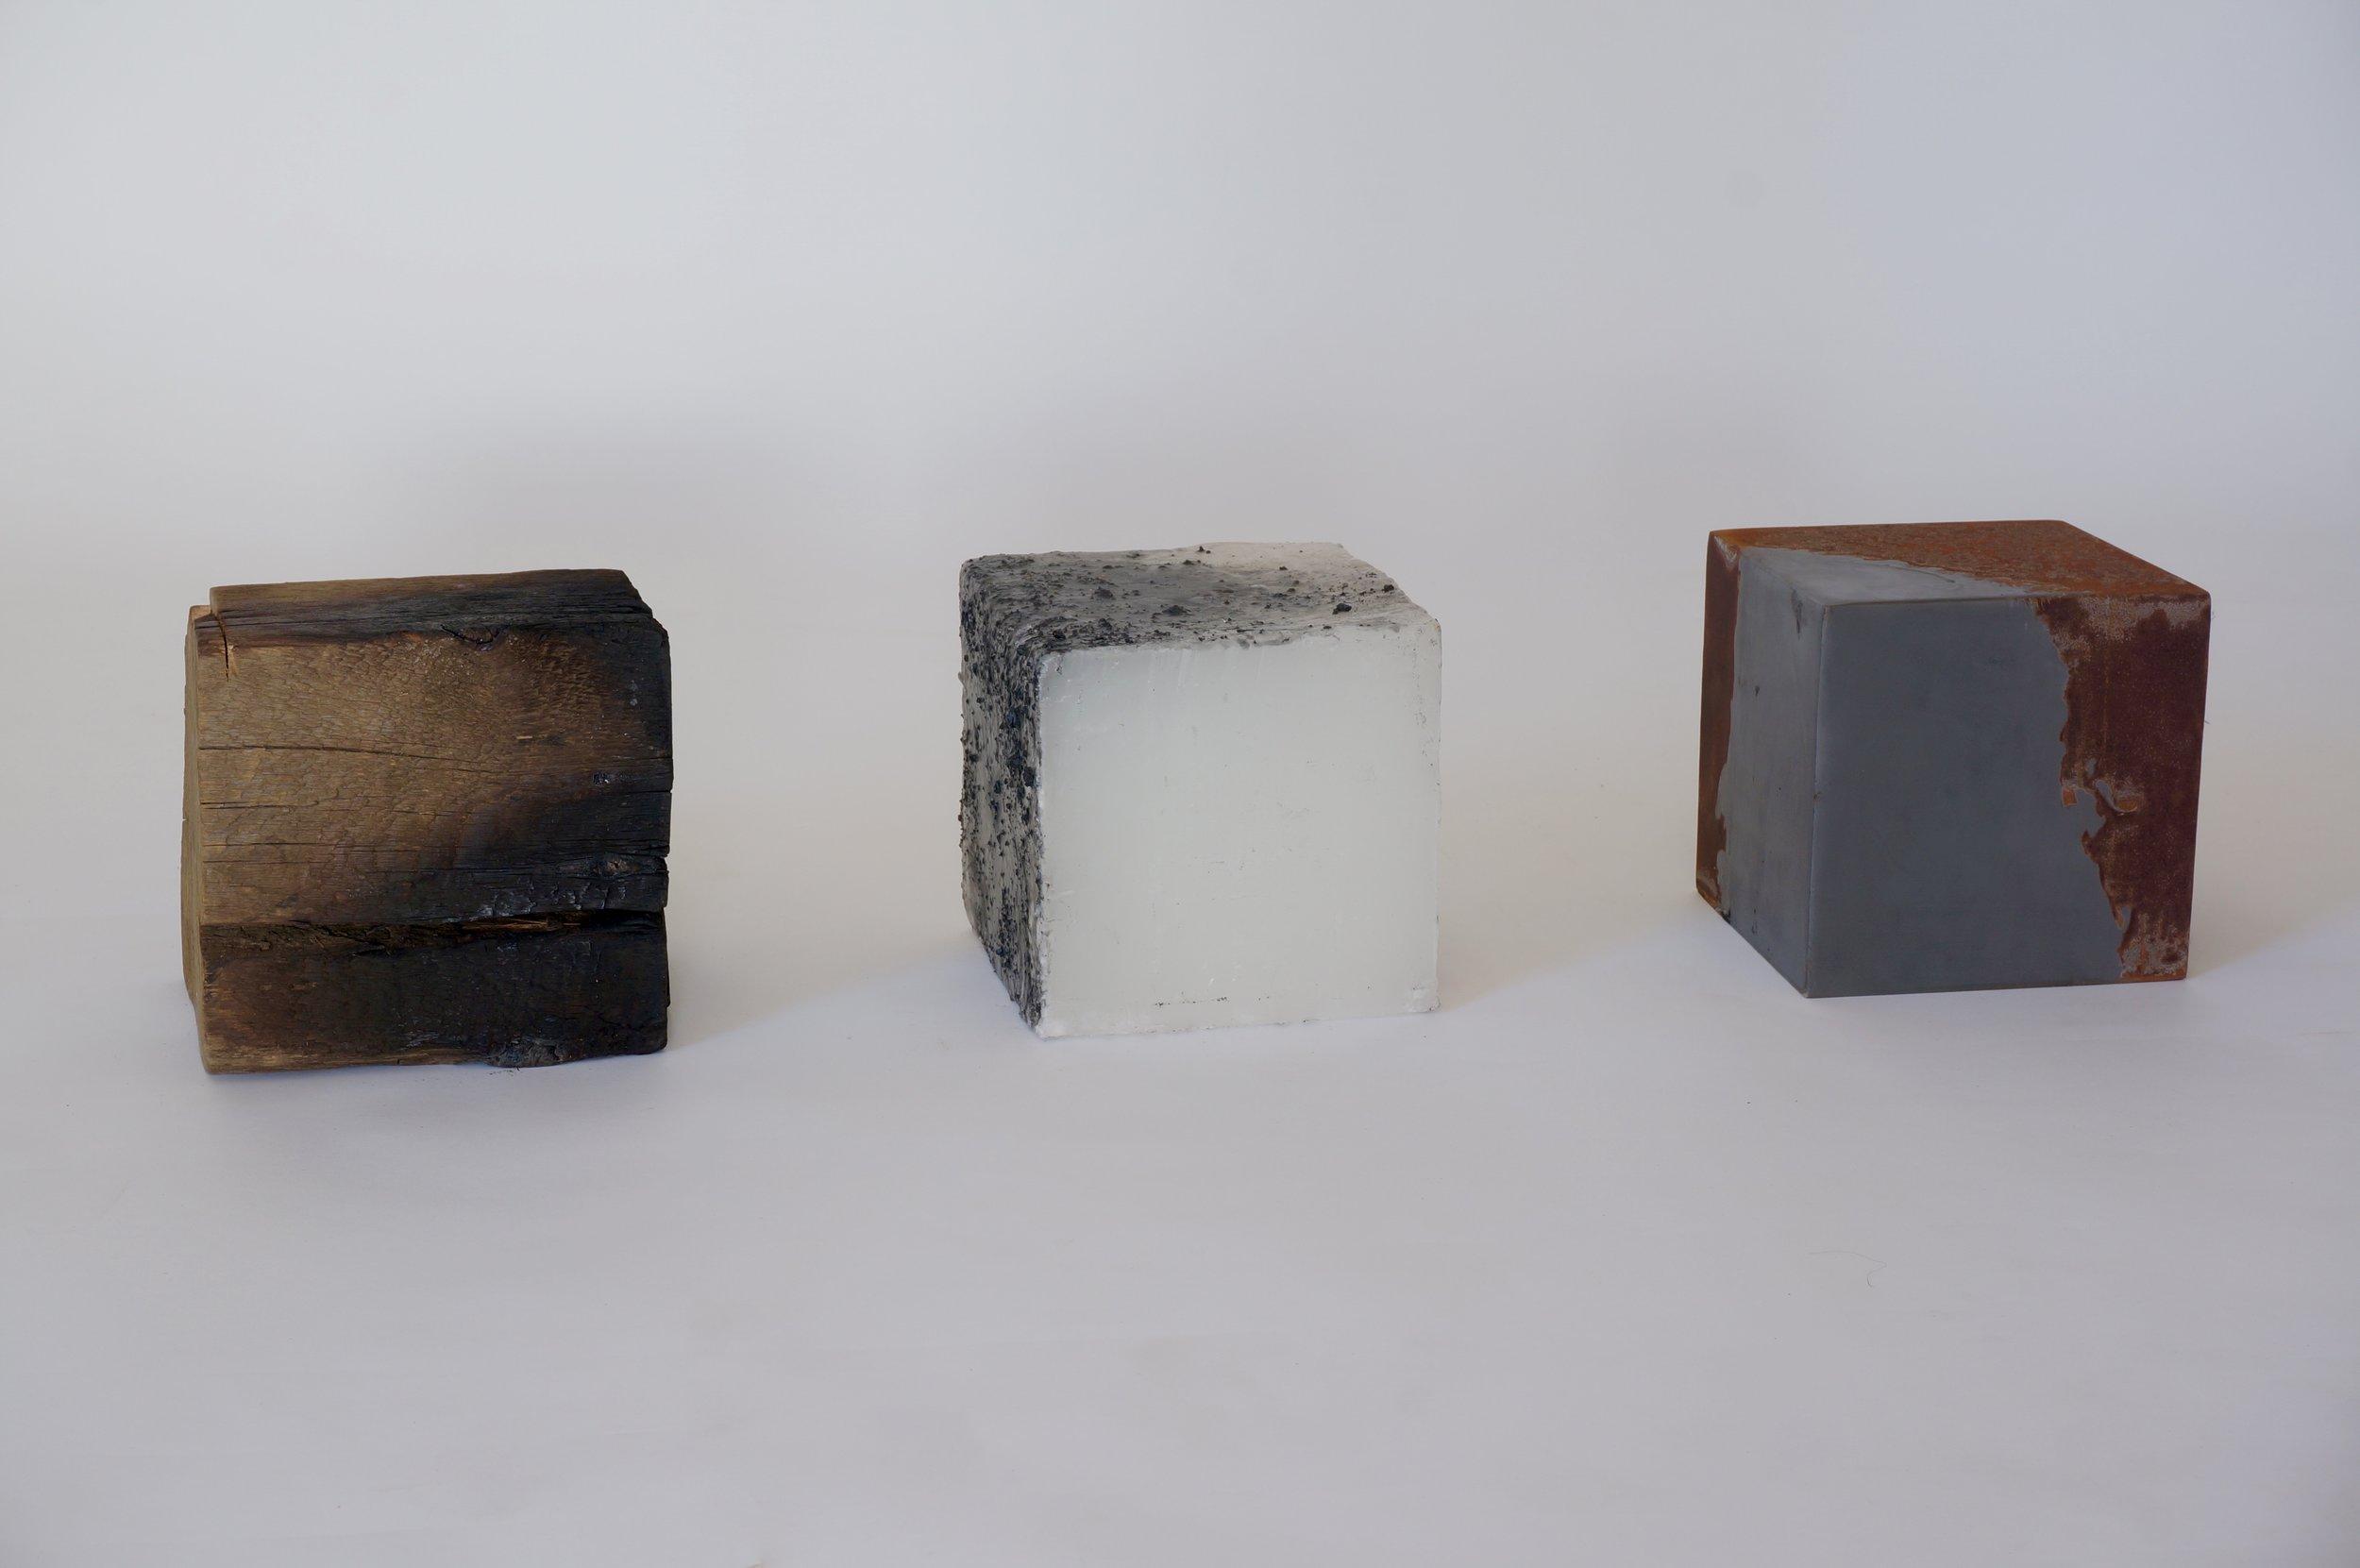 Permanence: Wood, Oil, Steel